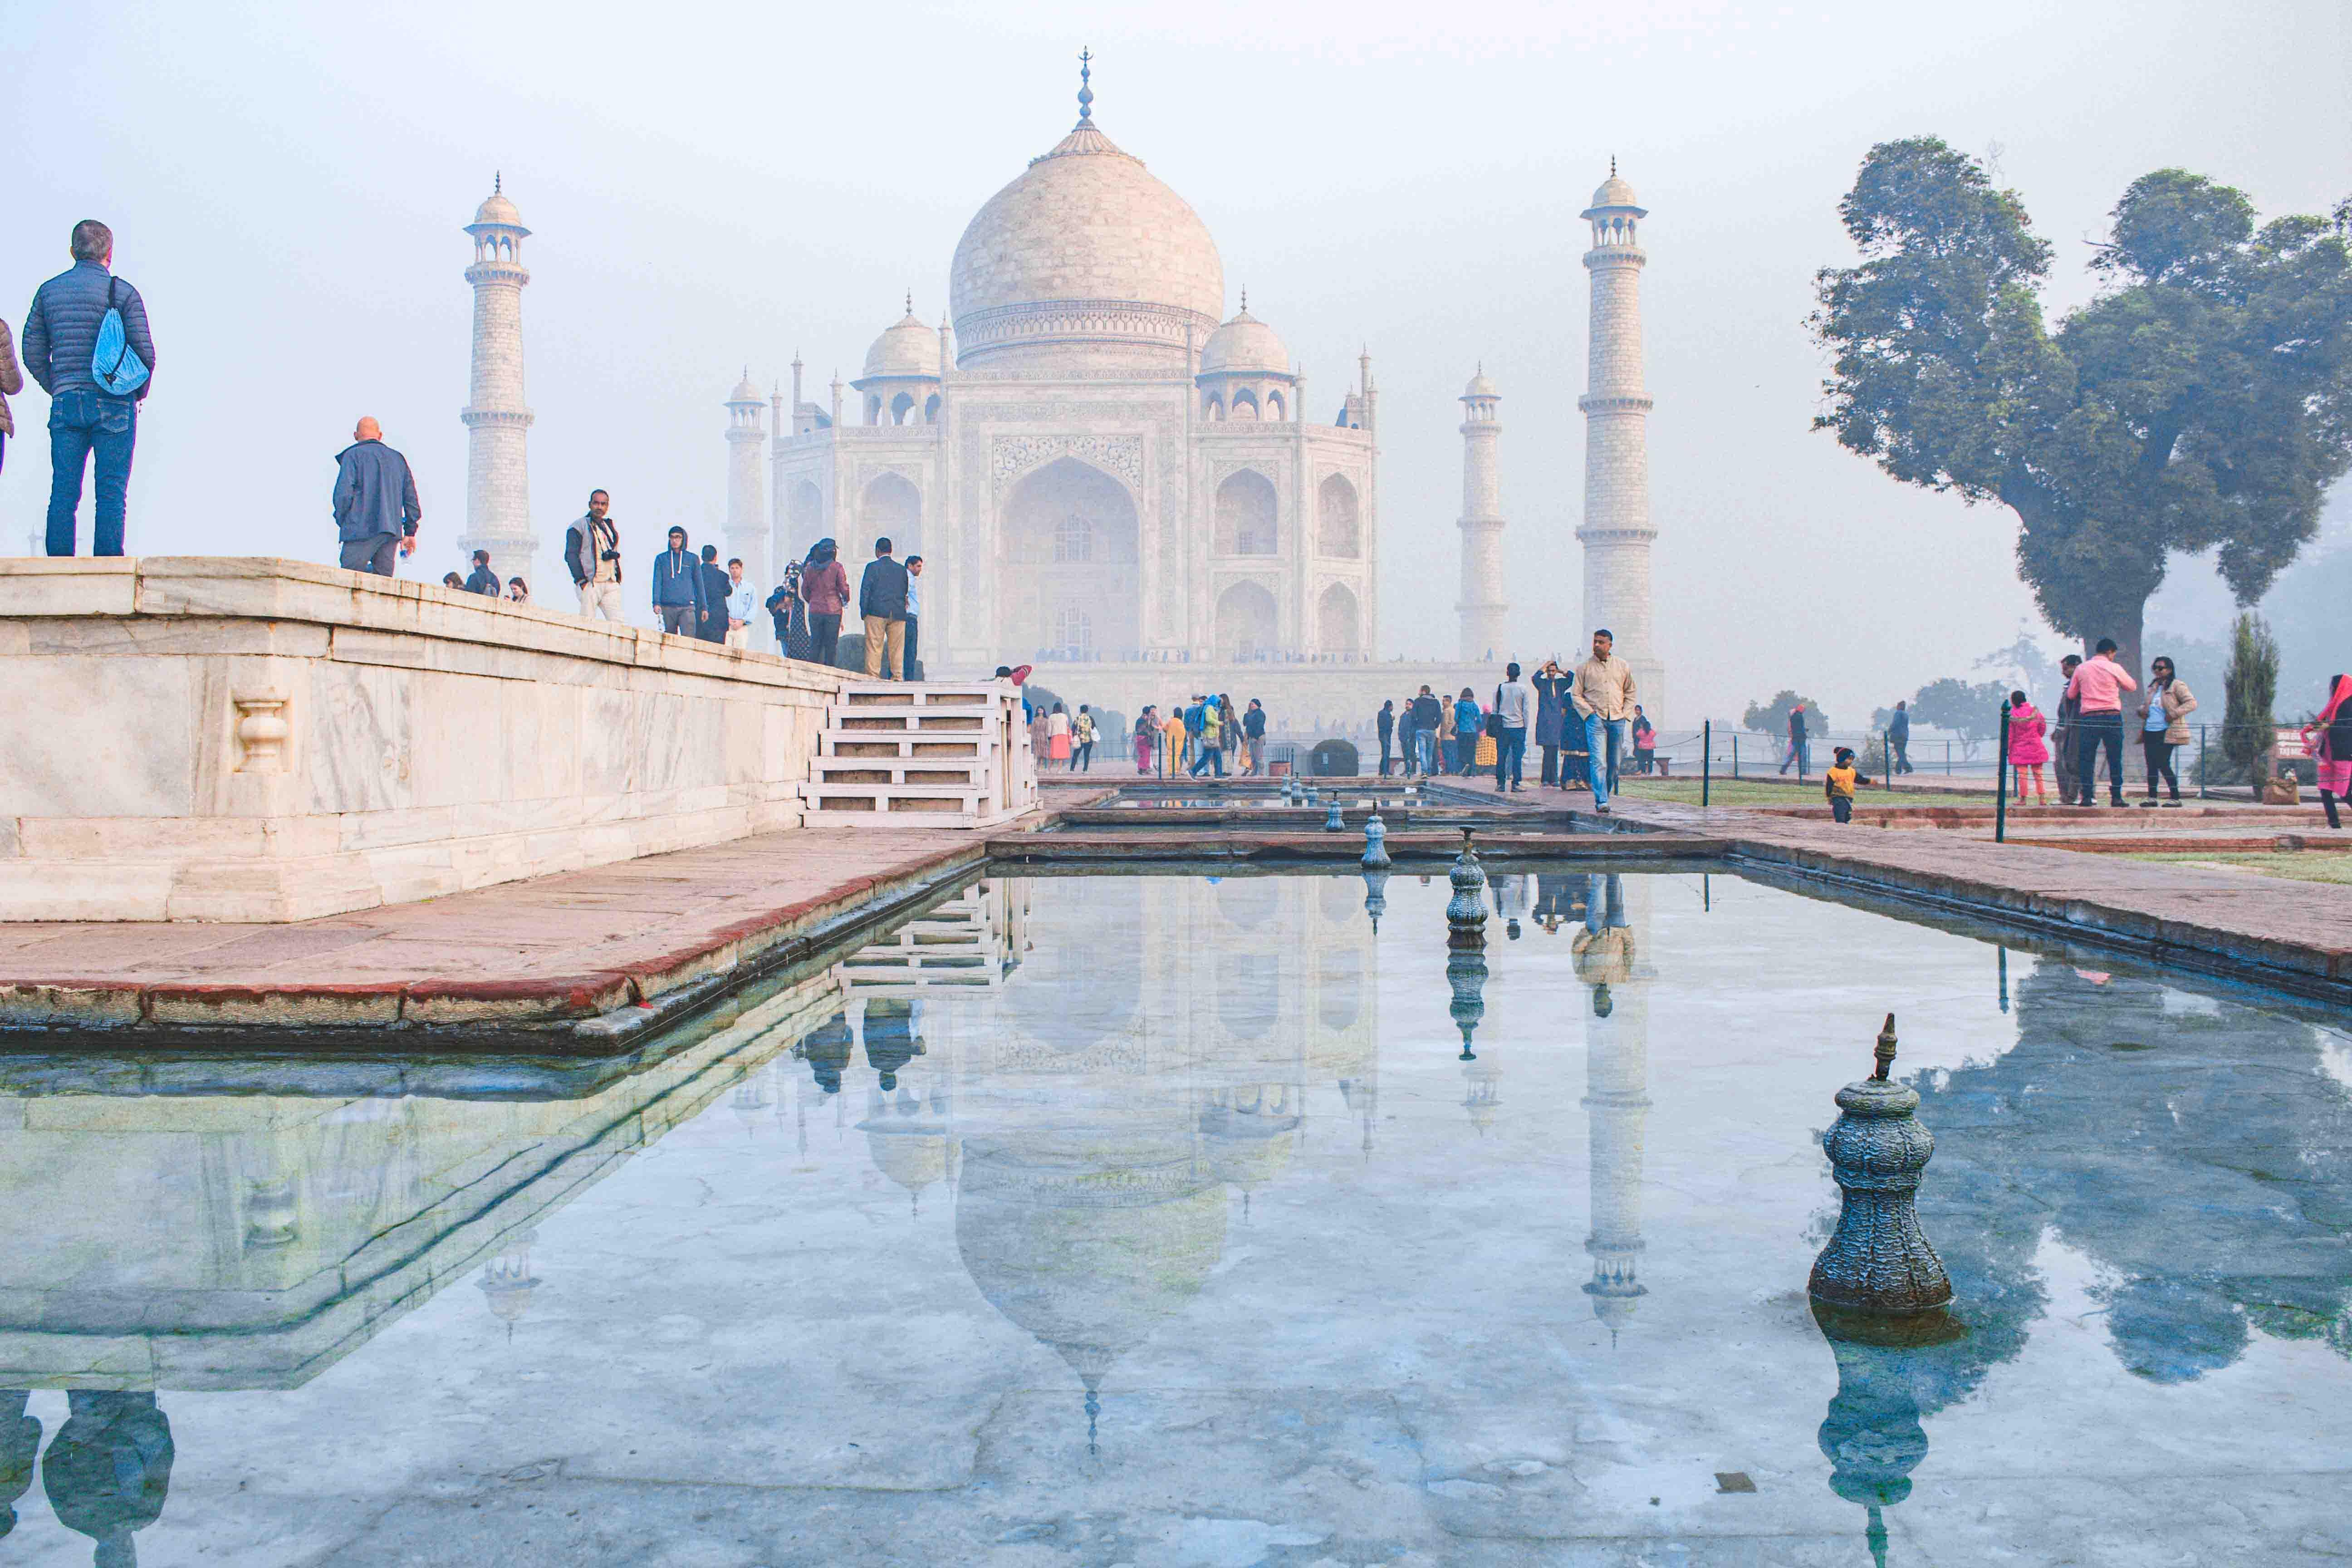 Agra: Sunrise Taj Mahal Tour Including Hotel Pick-up and drop-off